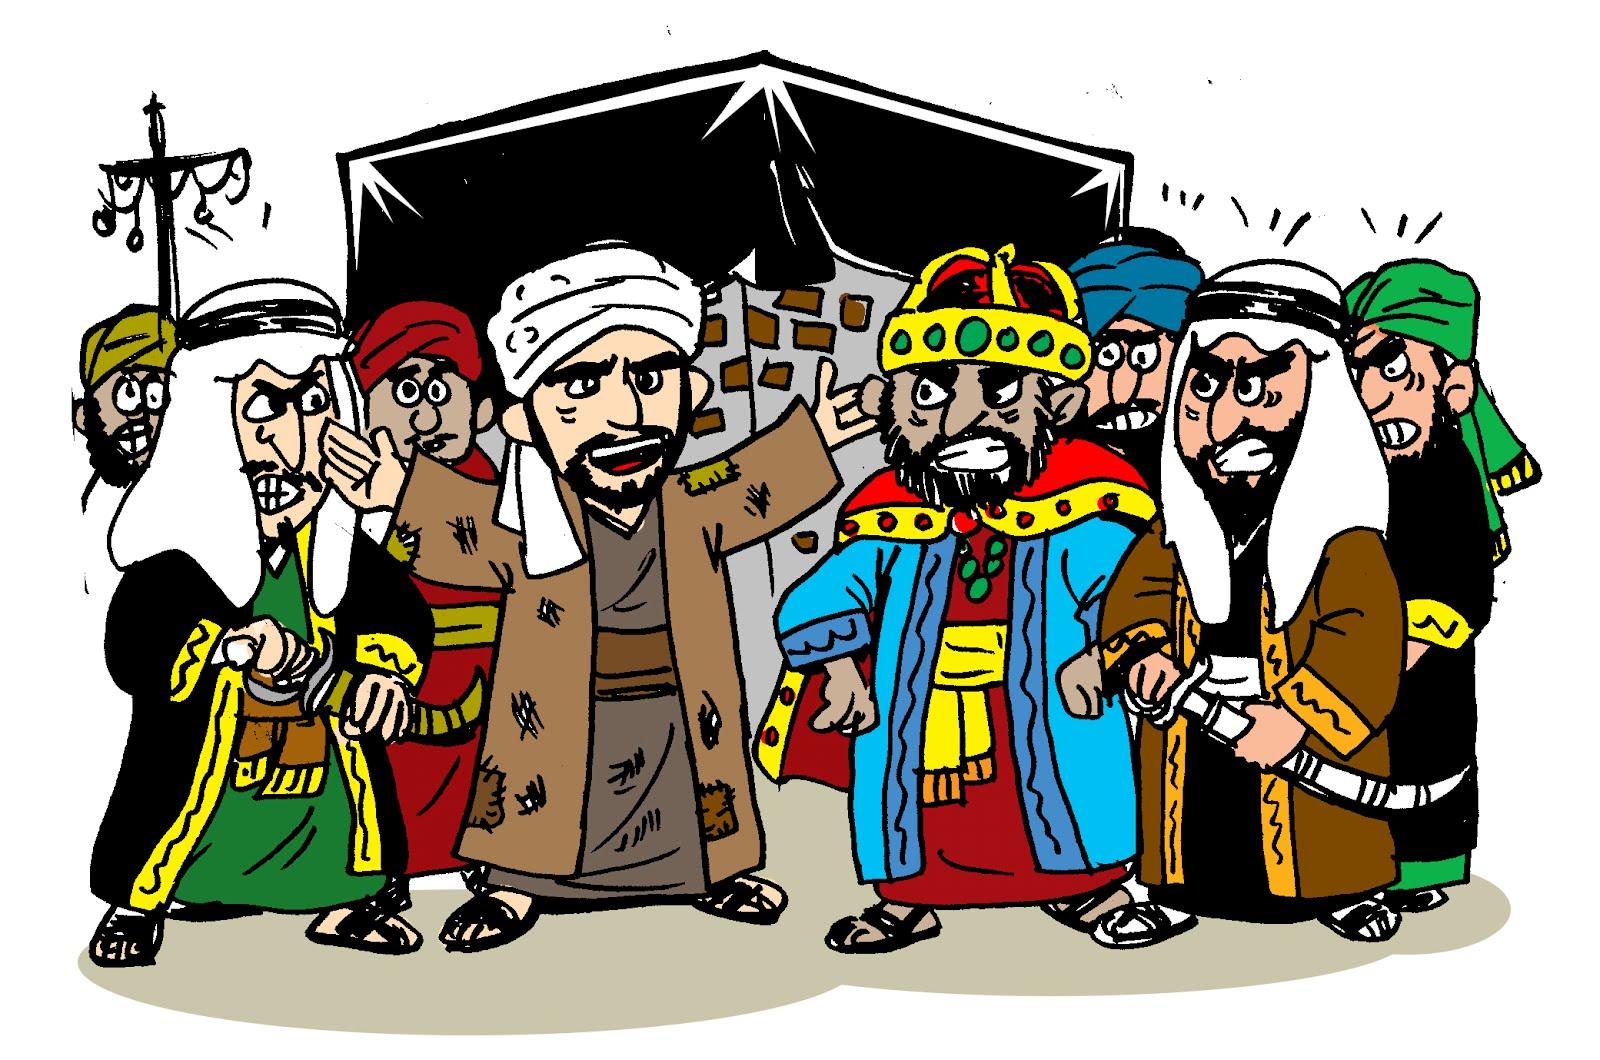 Murda Dwie J2c006023 Alchemist 2012 Produk Ukm Bumn Handbody Kesederhanaan Abu Dzar Al Ghifari